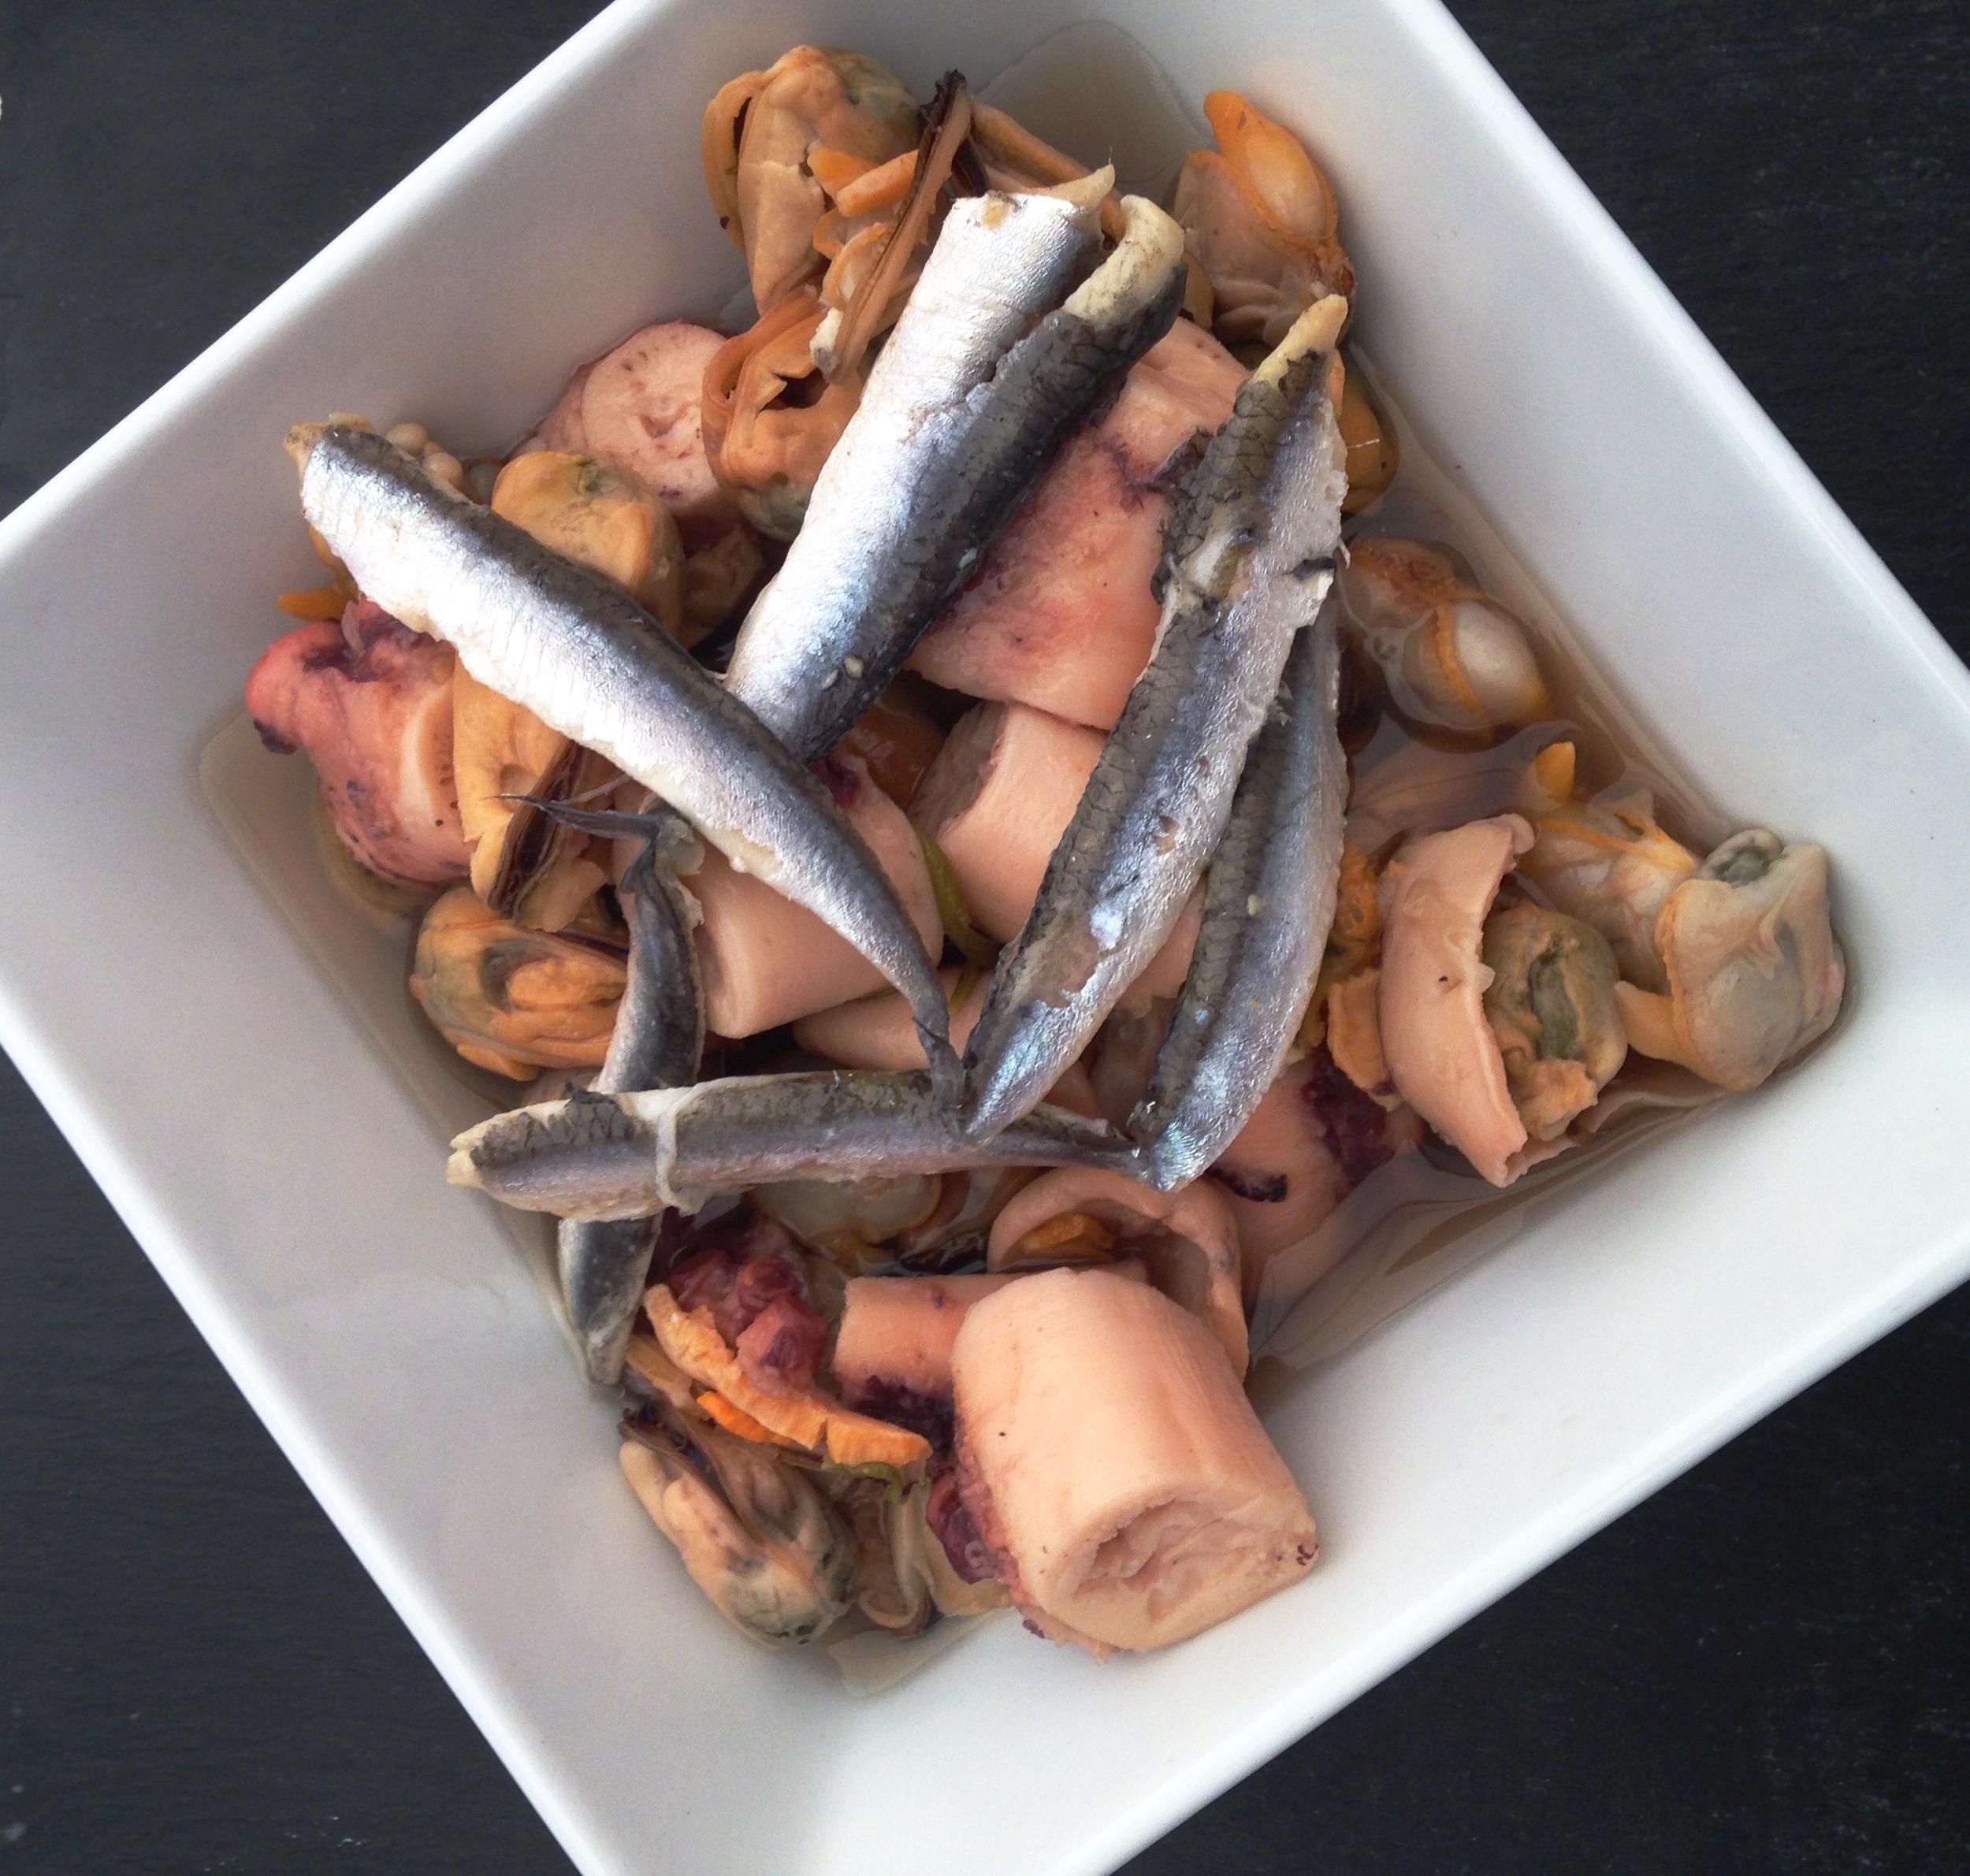 Doombar pickled seafood salad